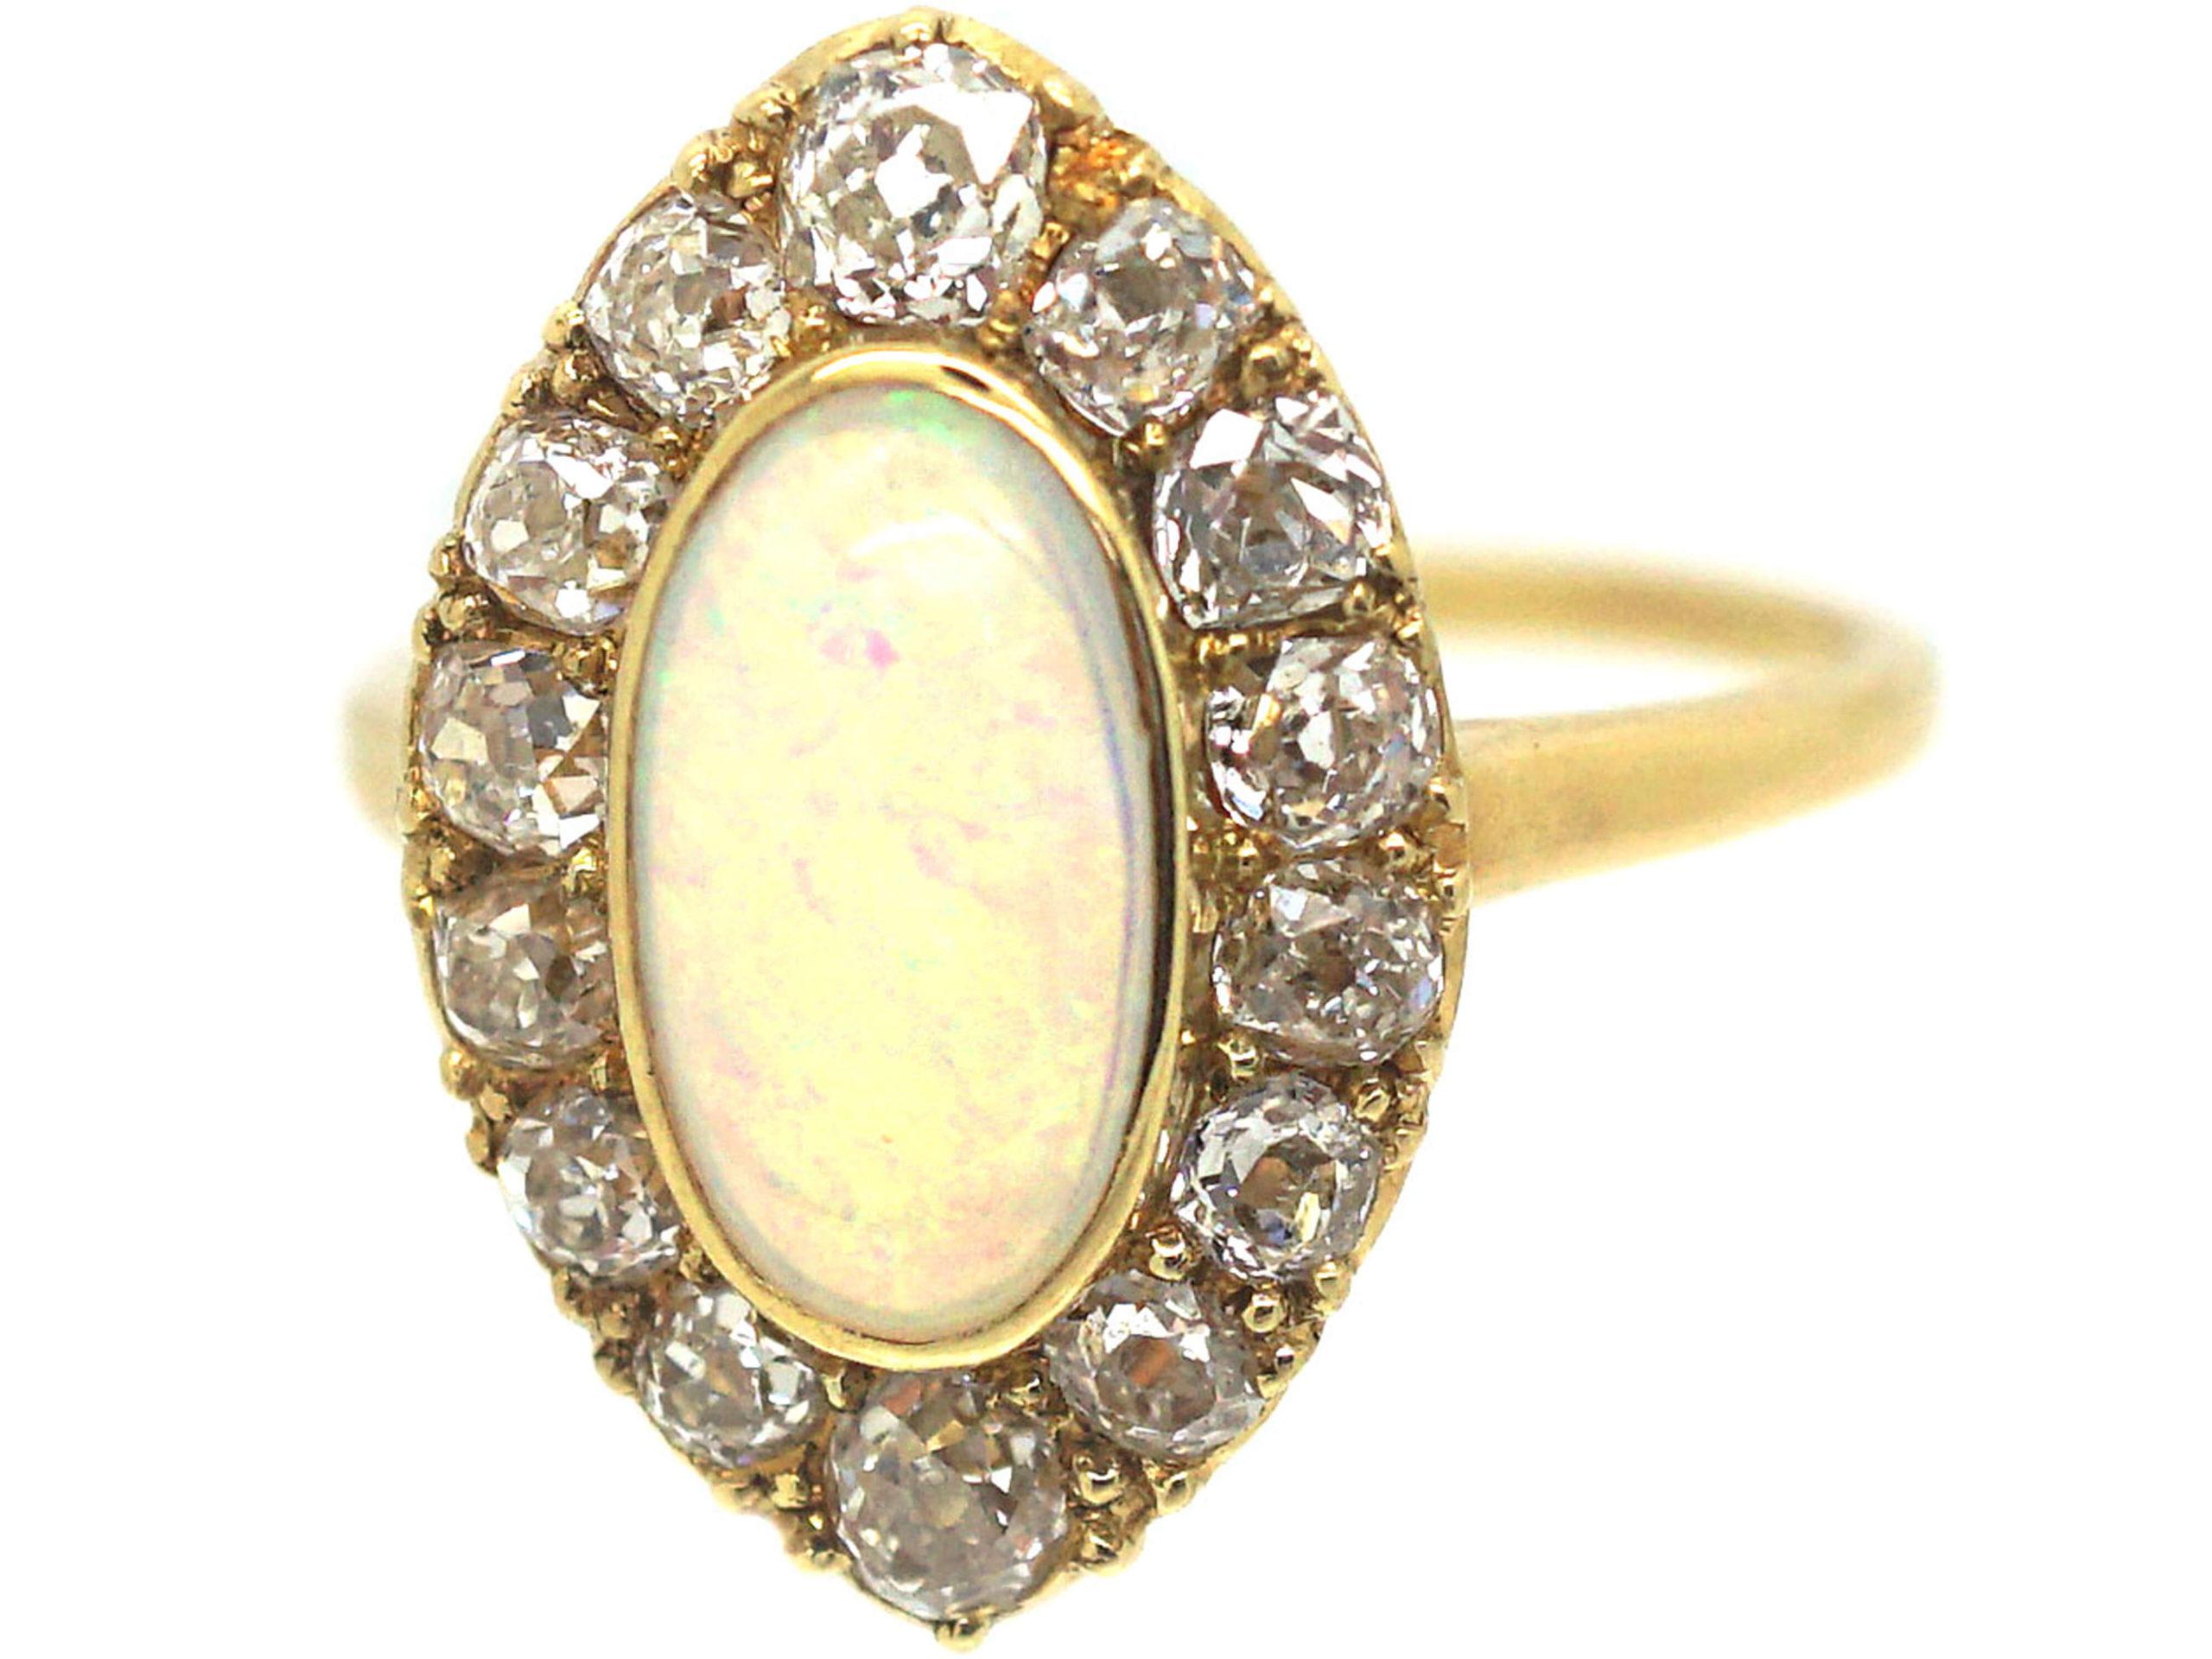 Edwardian 18ct Gold, Opal & Diamond Navette Shaped Ring